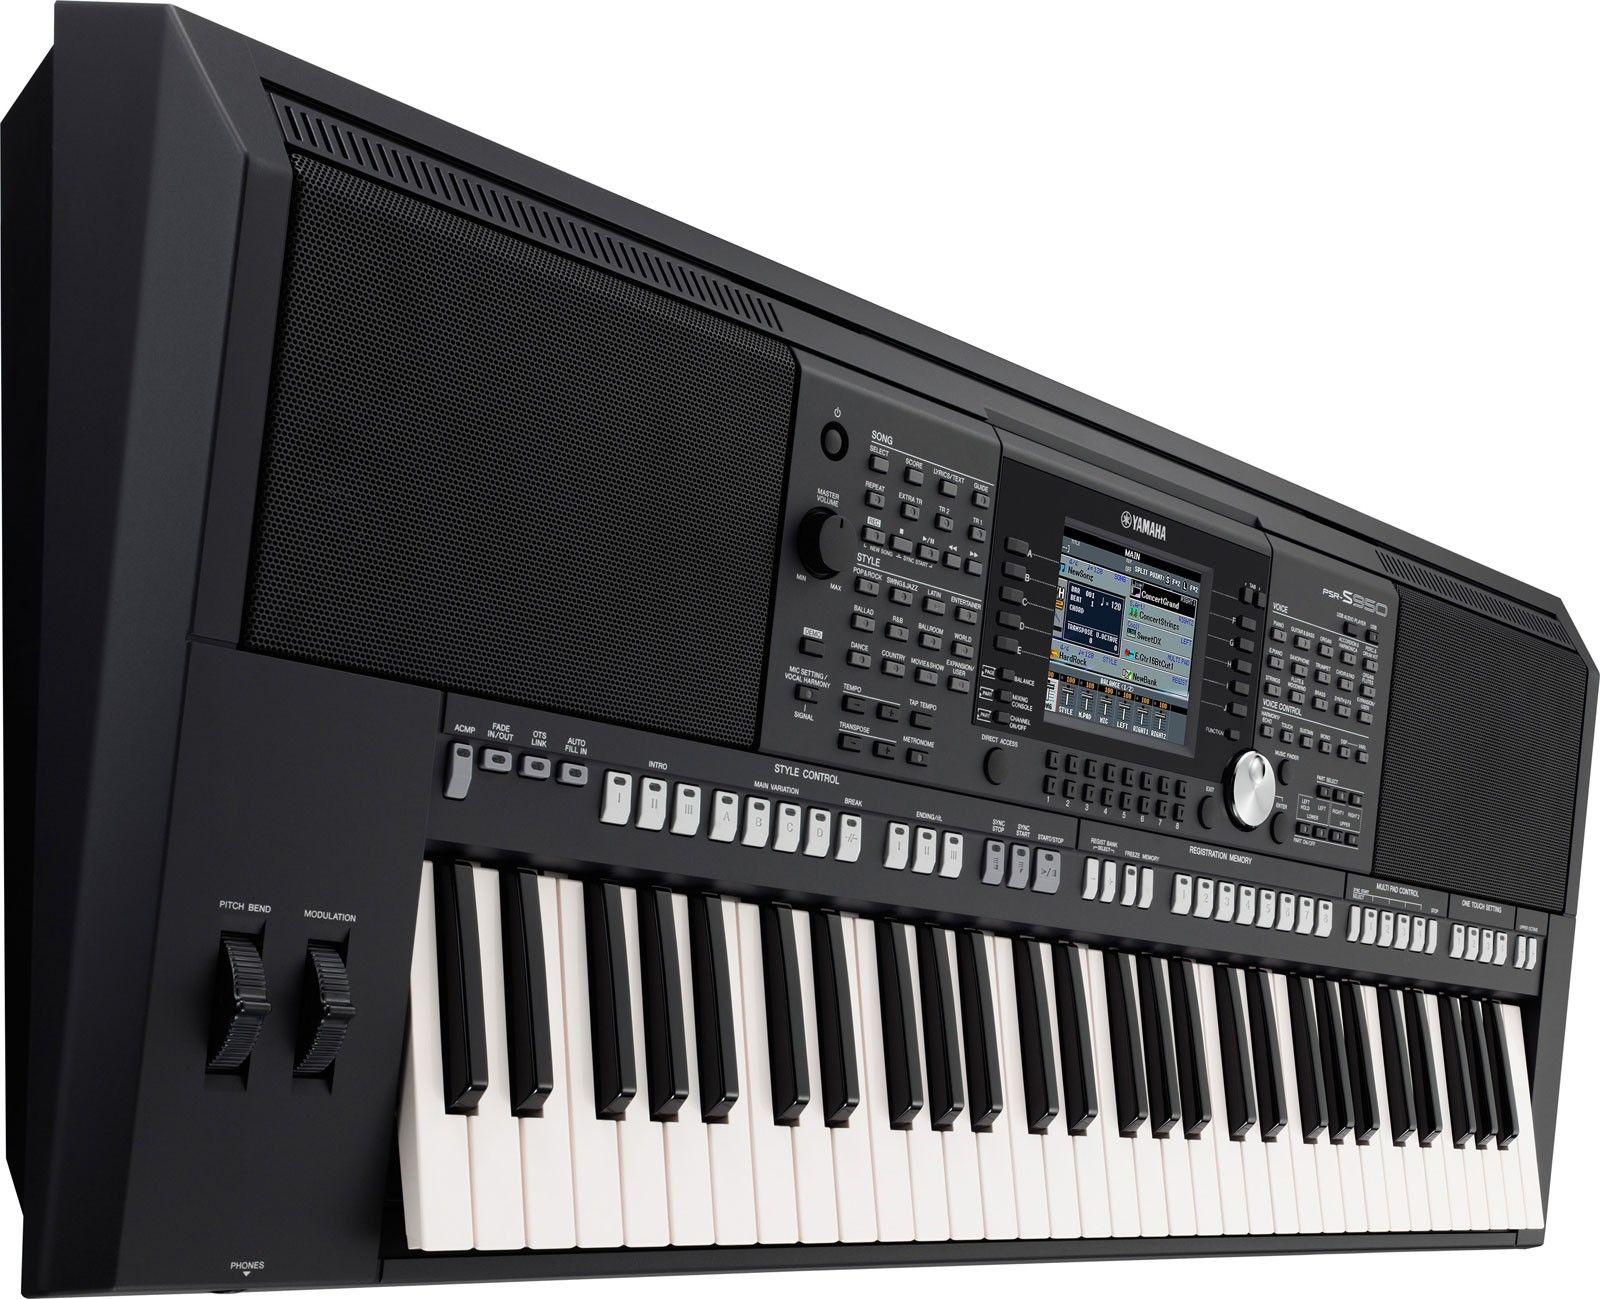 PSR-S950 YAMAHA keyboard | MUSIC ARMS | Musical Instruments